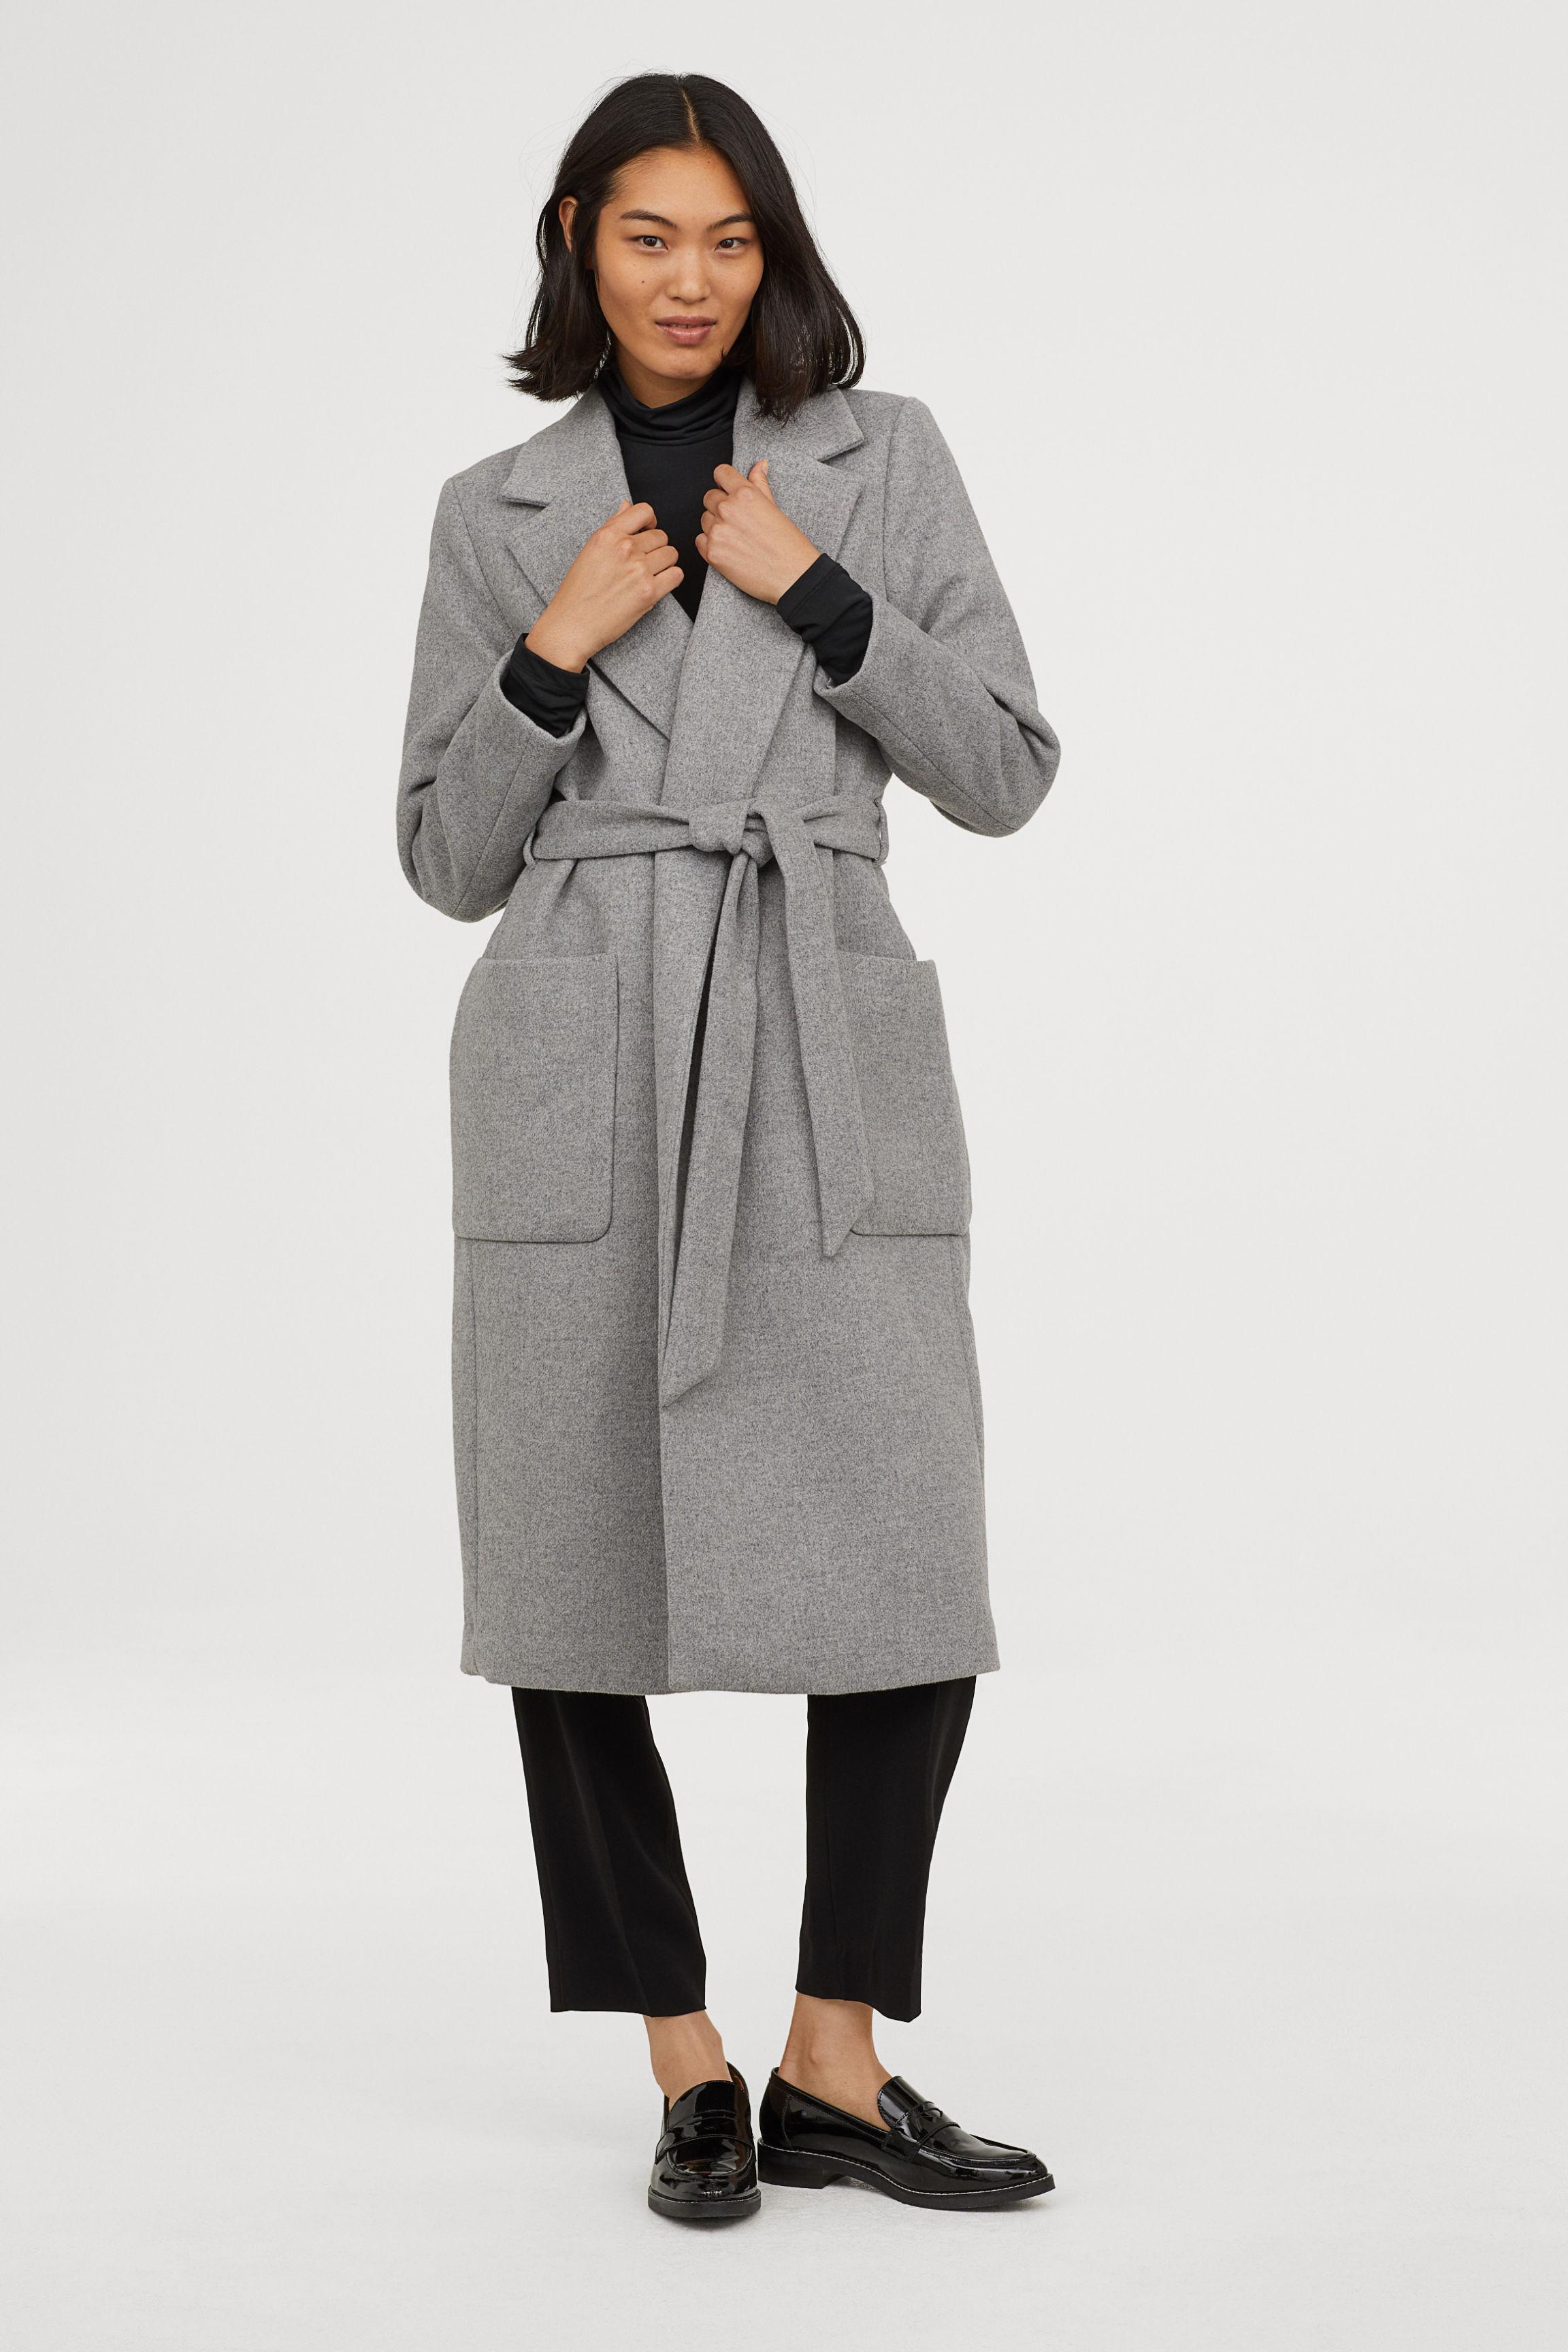 Coat with a tie belt - Light grey - Ladies   H&M GB